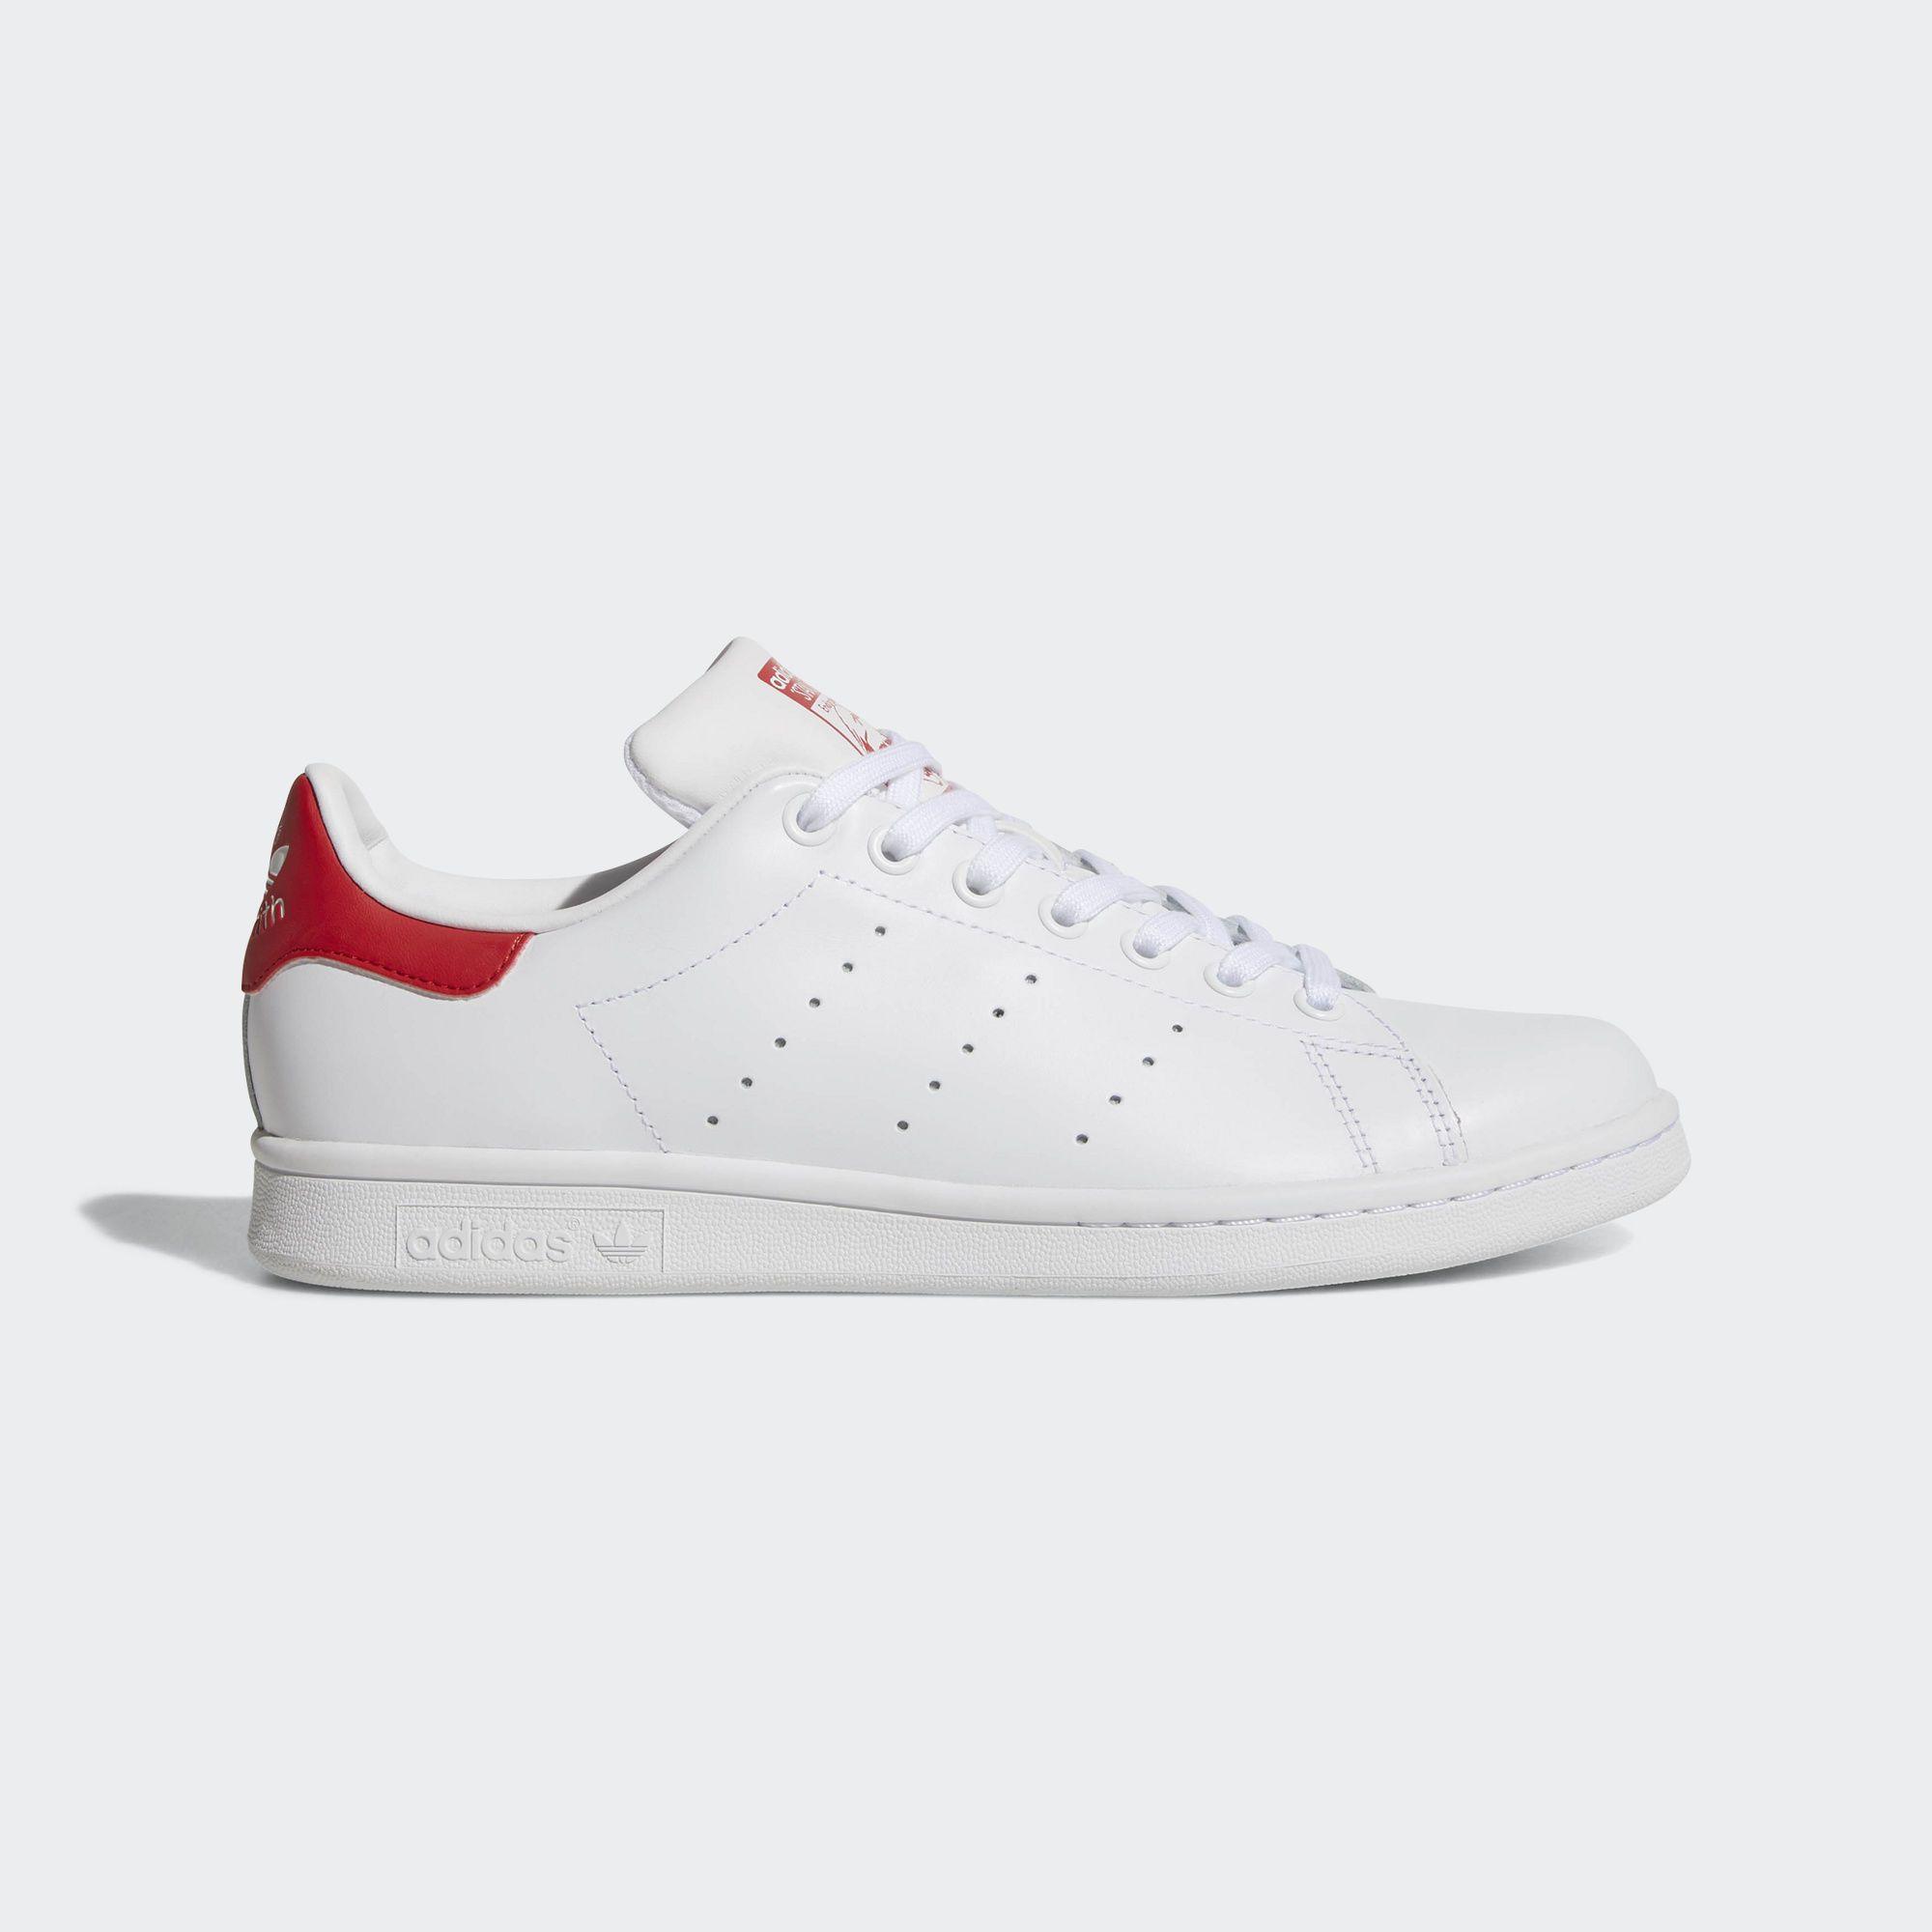 Adidas Originals Stan Smith – Coming